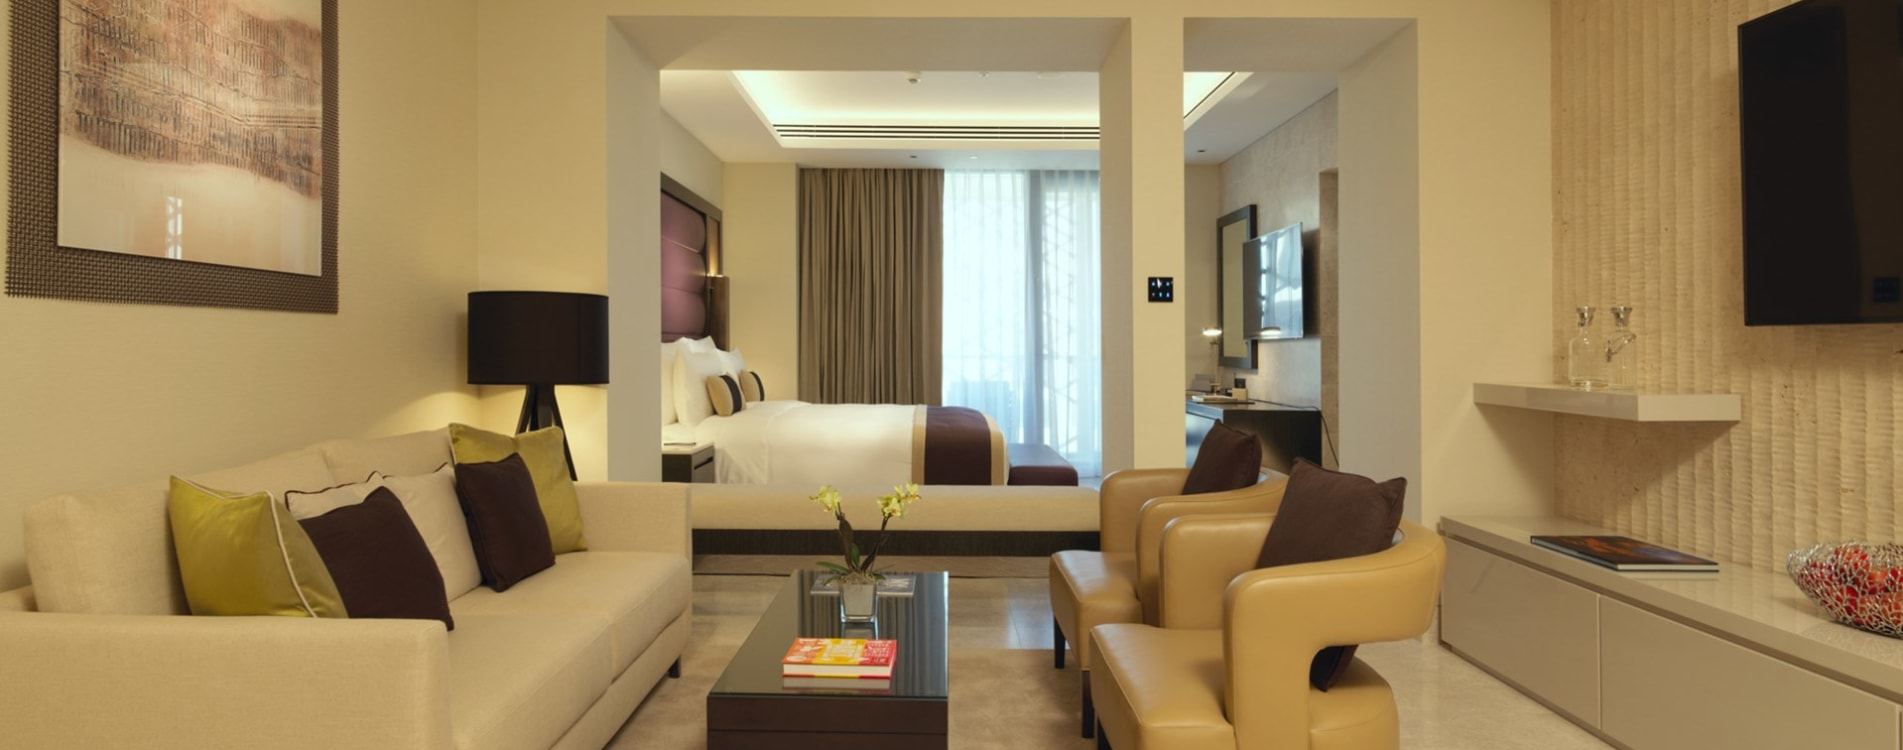 Kempinski-Hotel-Muscat-Junior-Suite-Interior-Oman